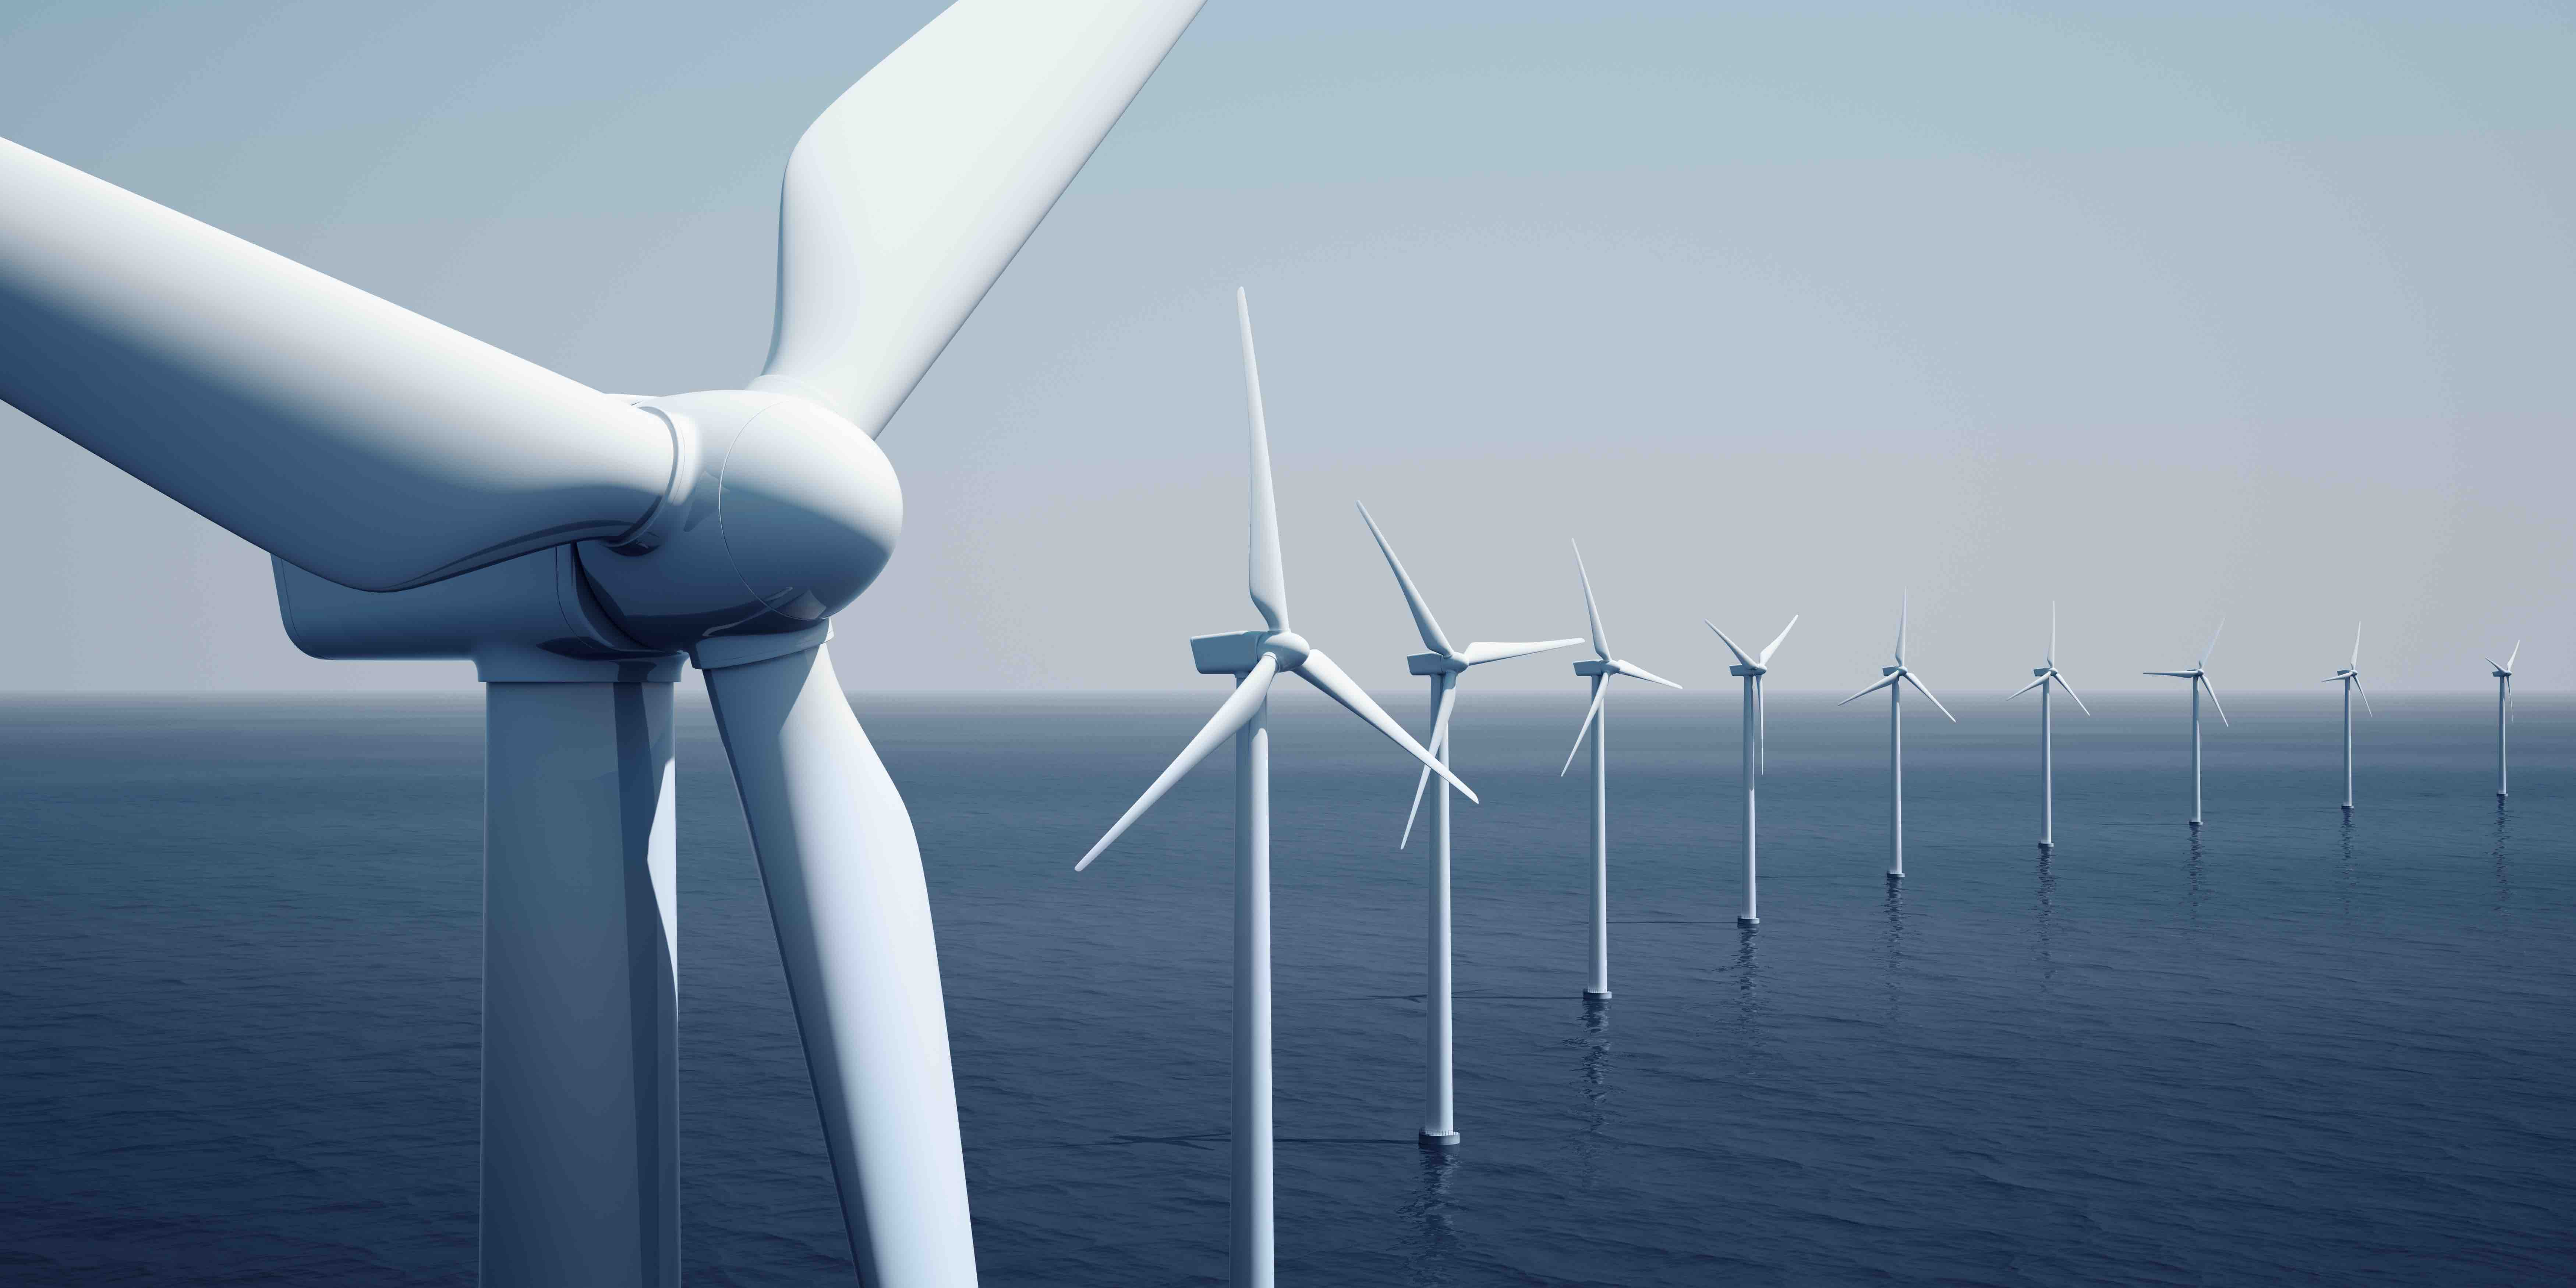 PGE invites partners to build wind farms in Baltic Sea